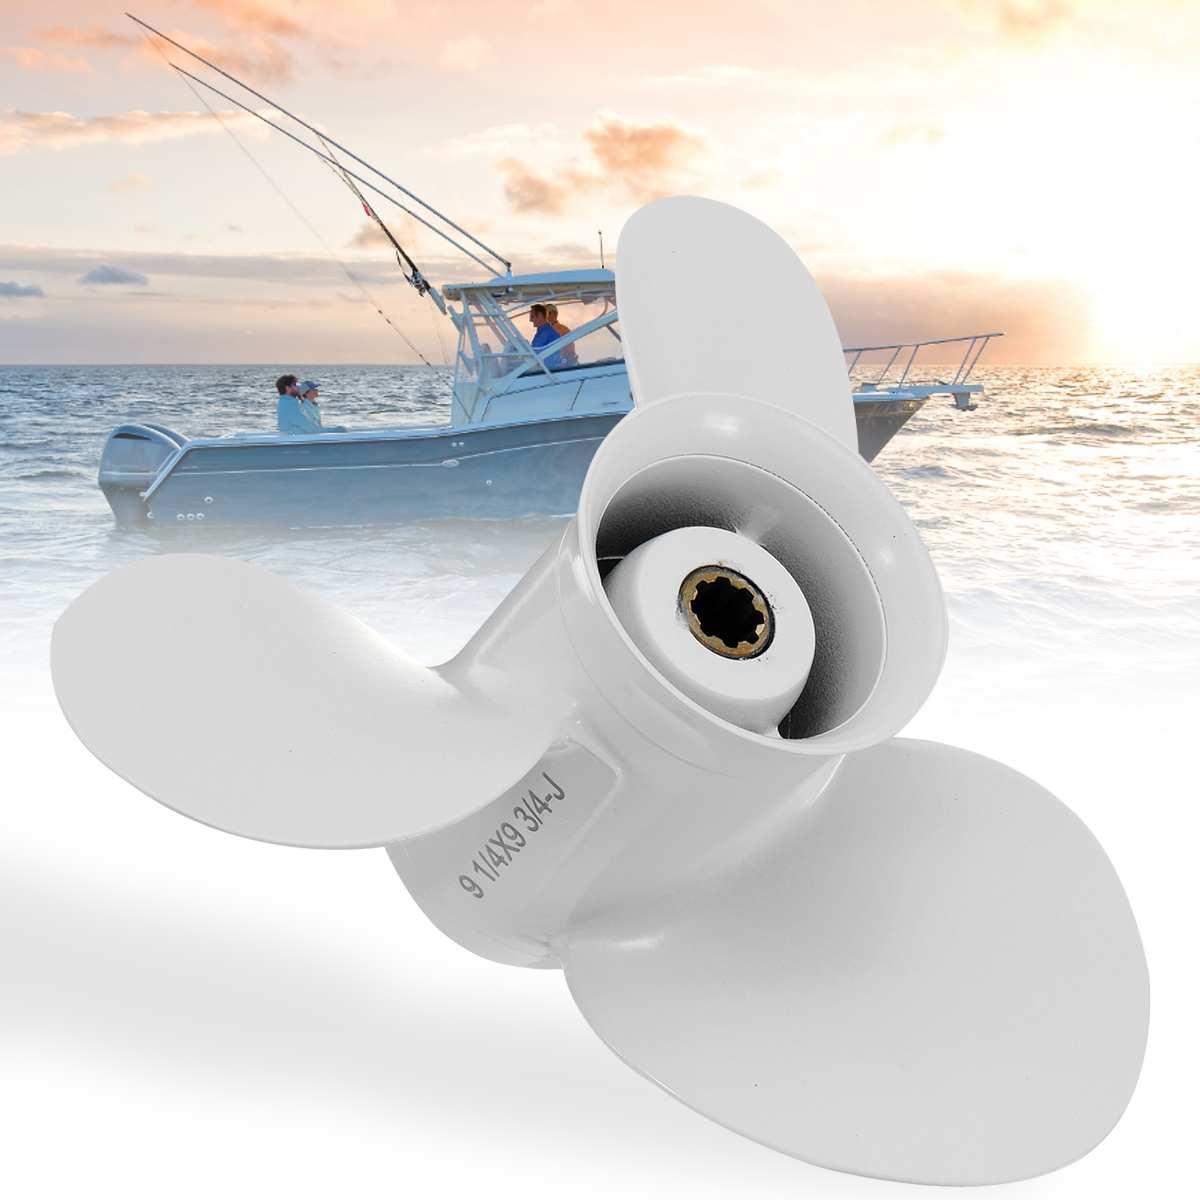 683 45952 00 EL 9 1 4 x 9 3 4 Boat Outboard Propeller For Yamaha